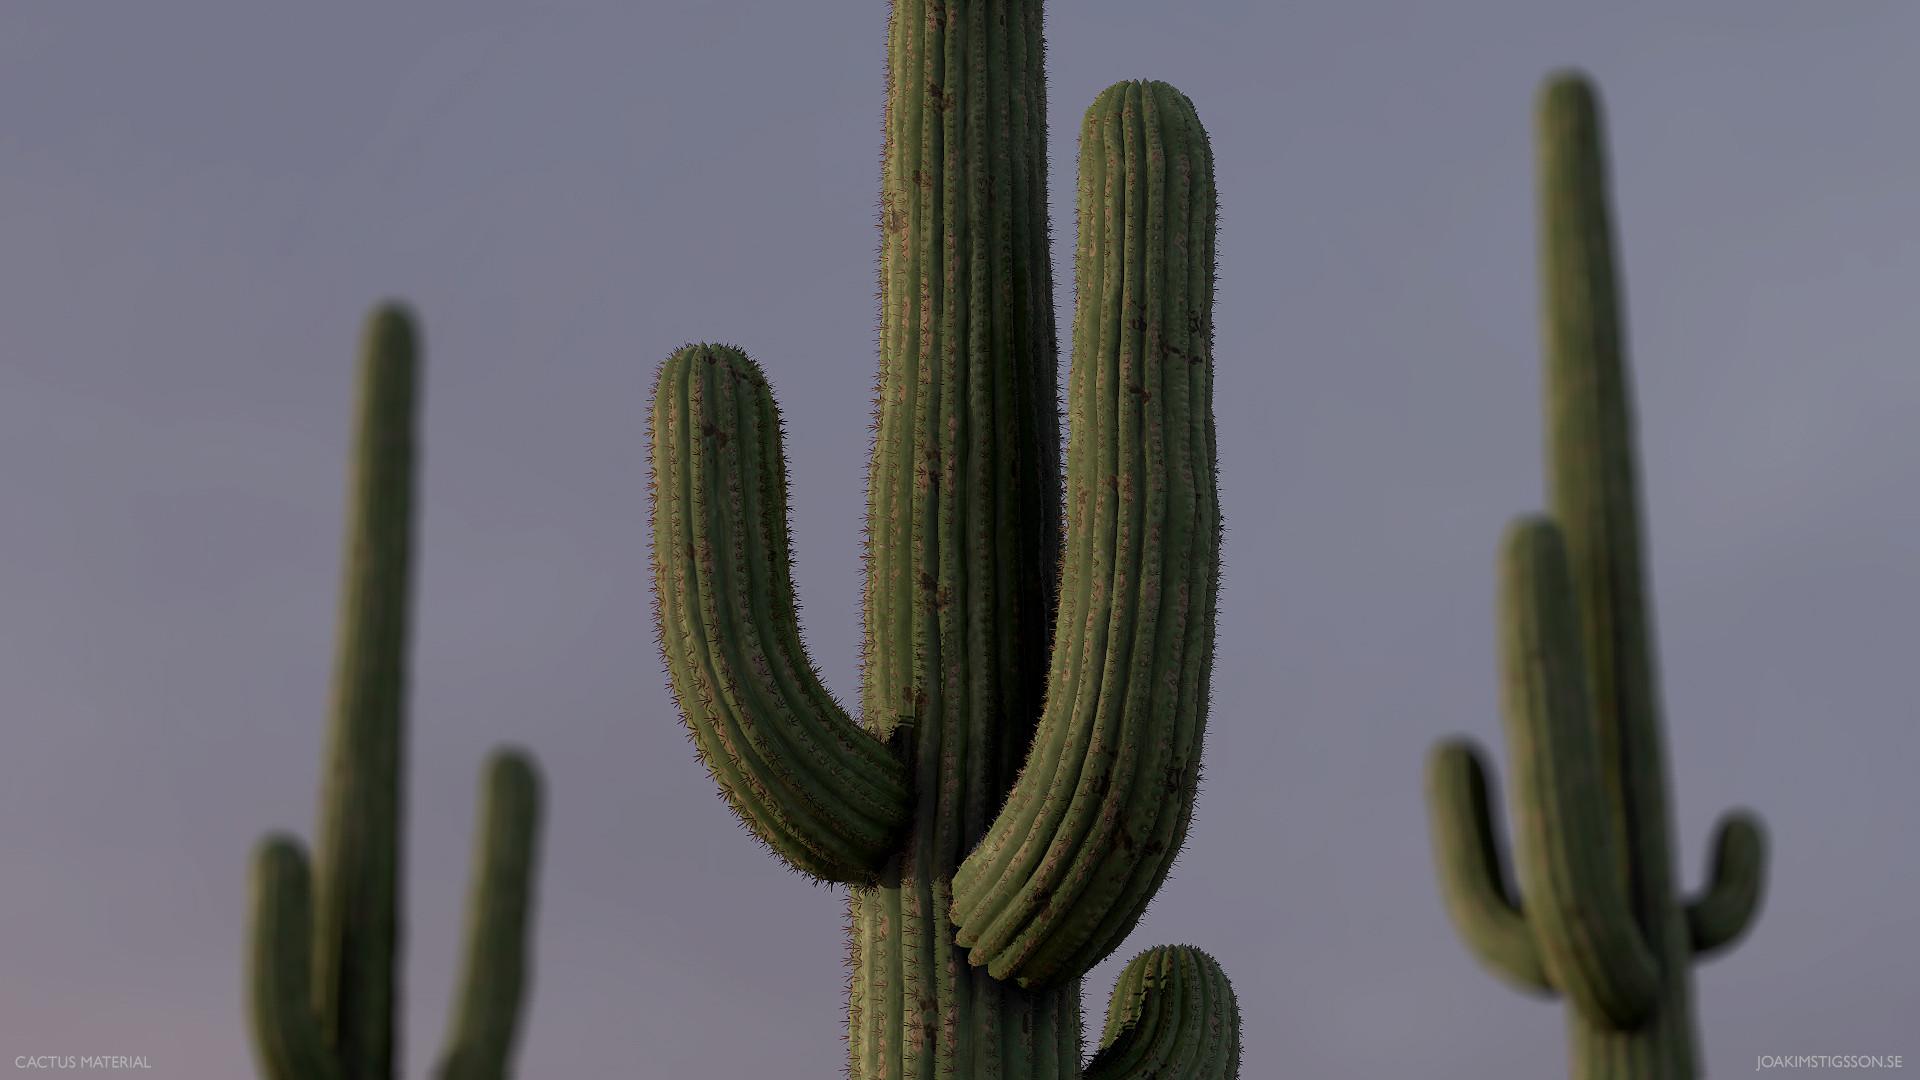 Joakim stigsson cactus 01 model